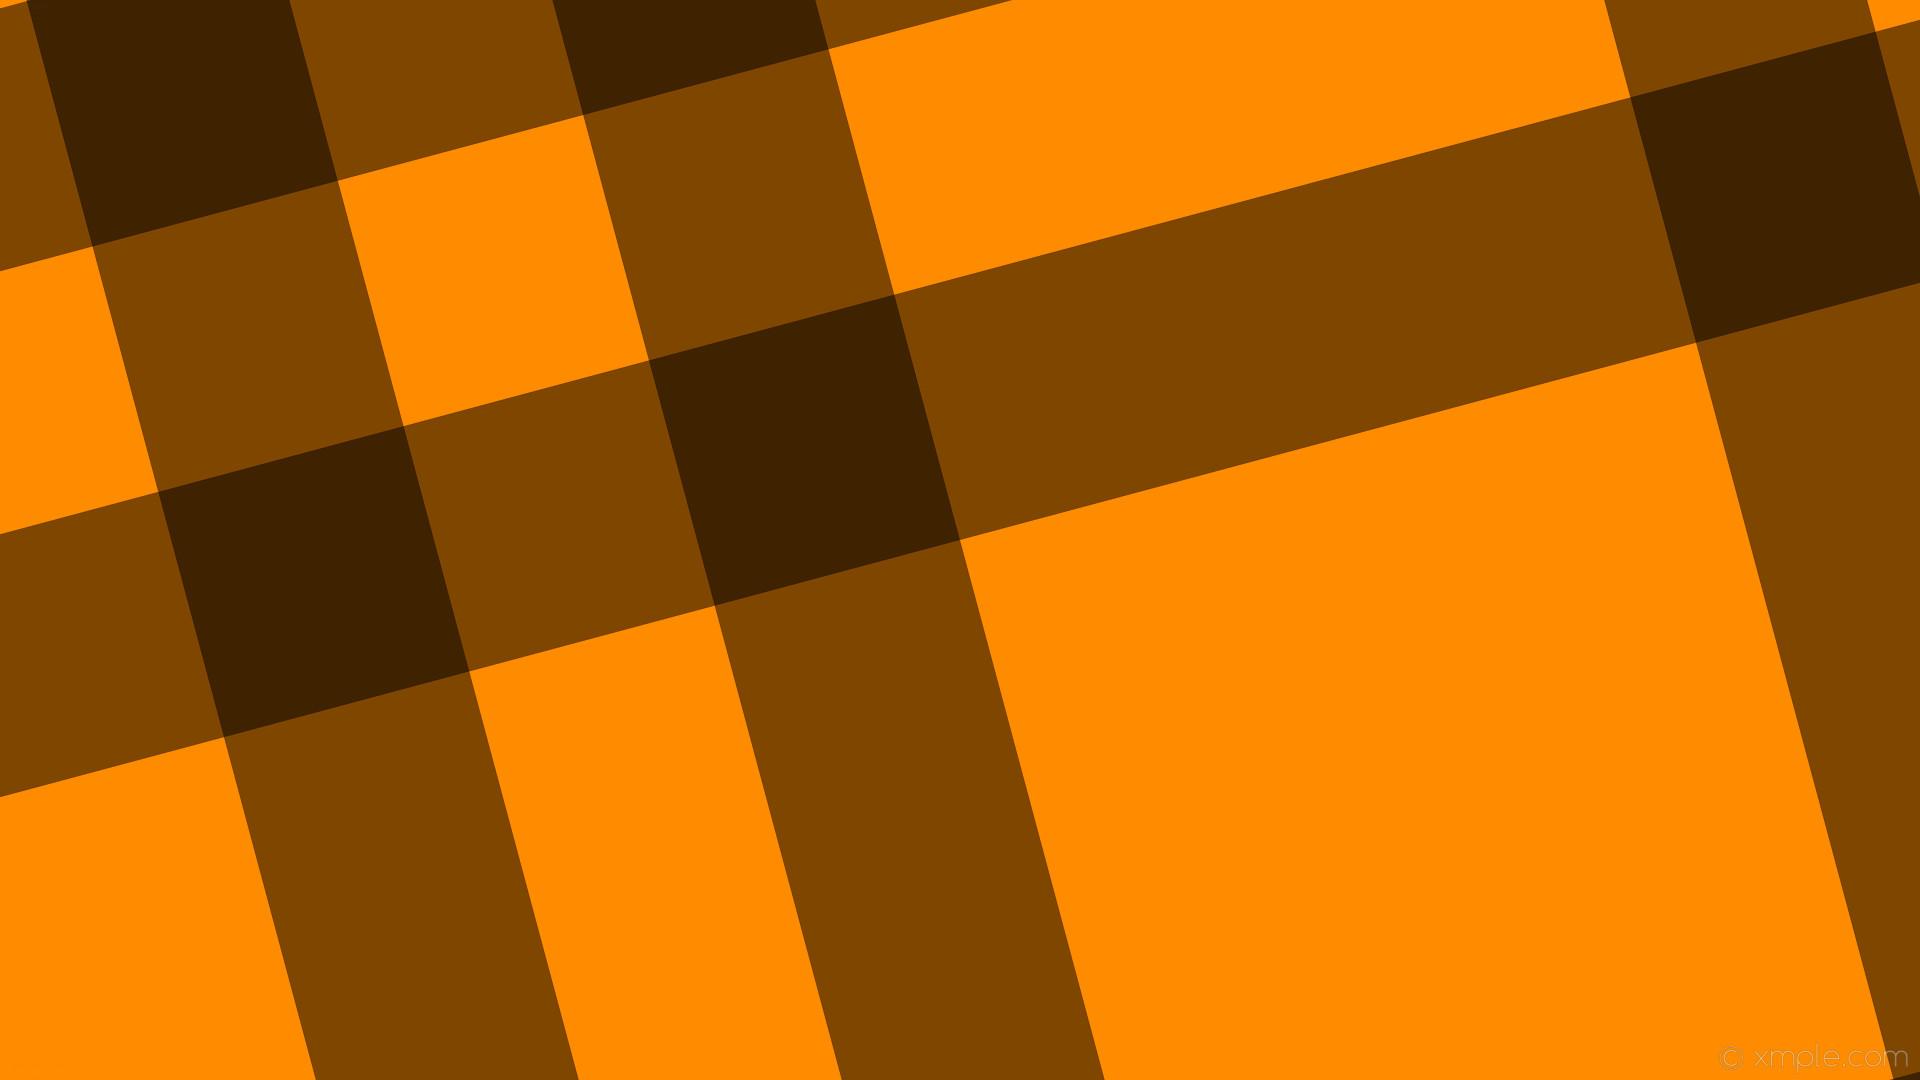 wallpaper gingham dual striped black orange dark orange #ff8c00 #000000  195° 254px